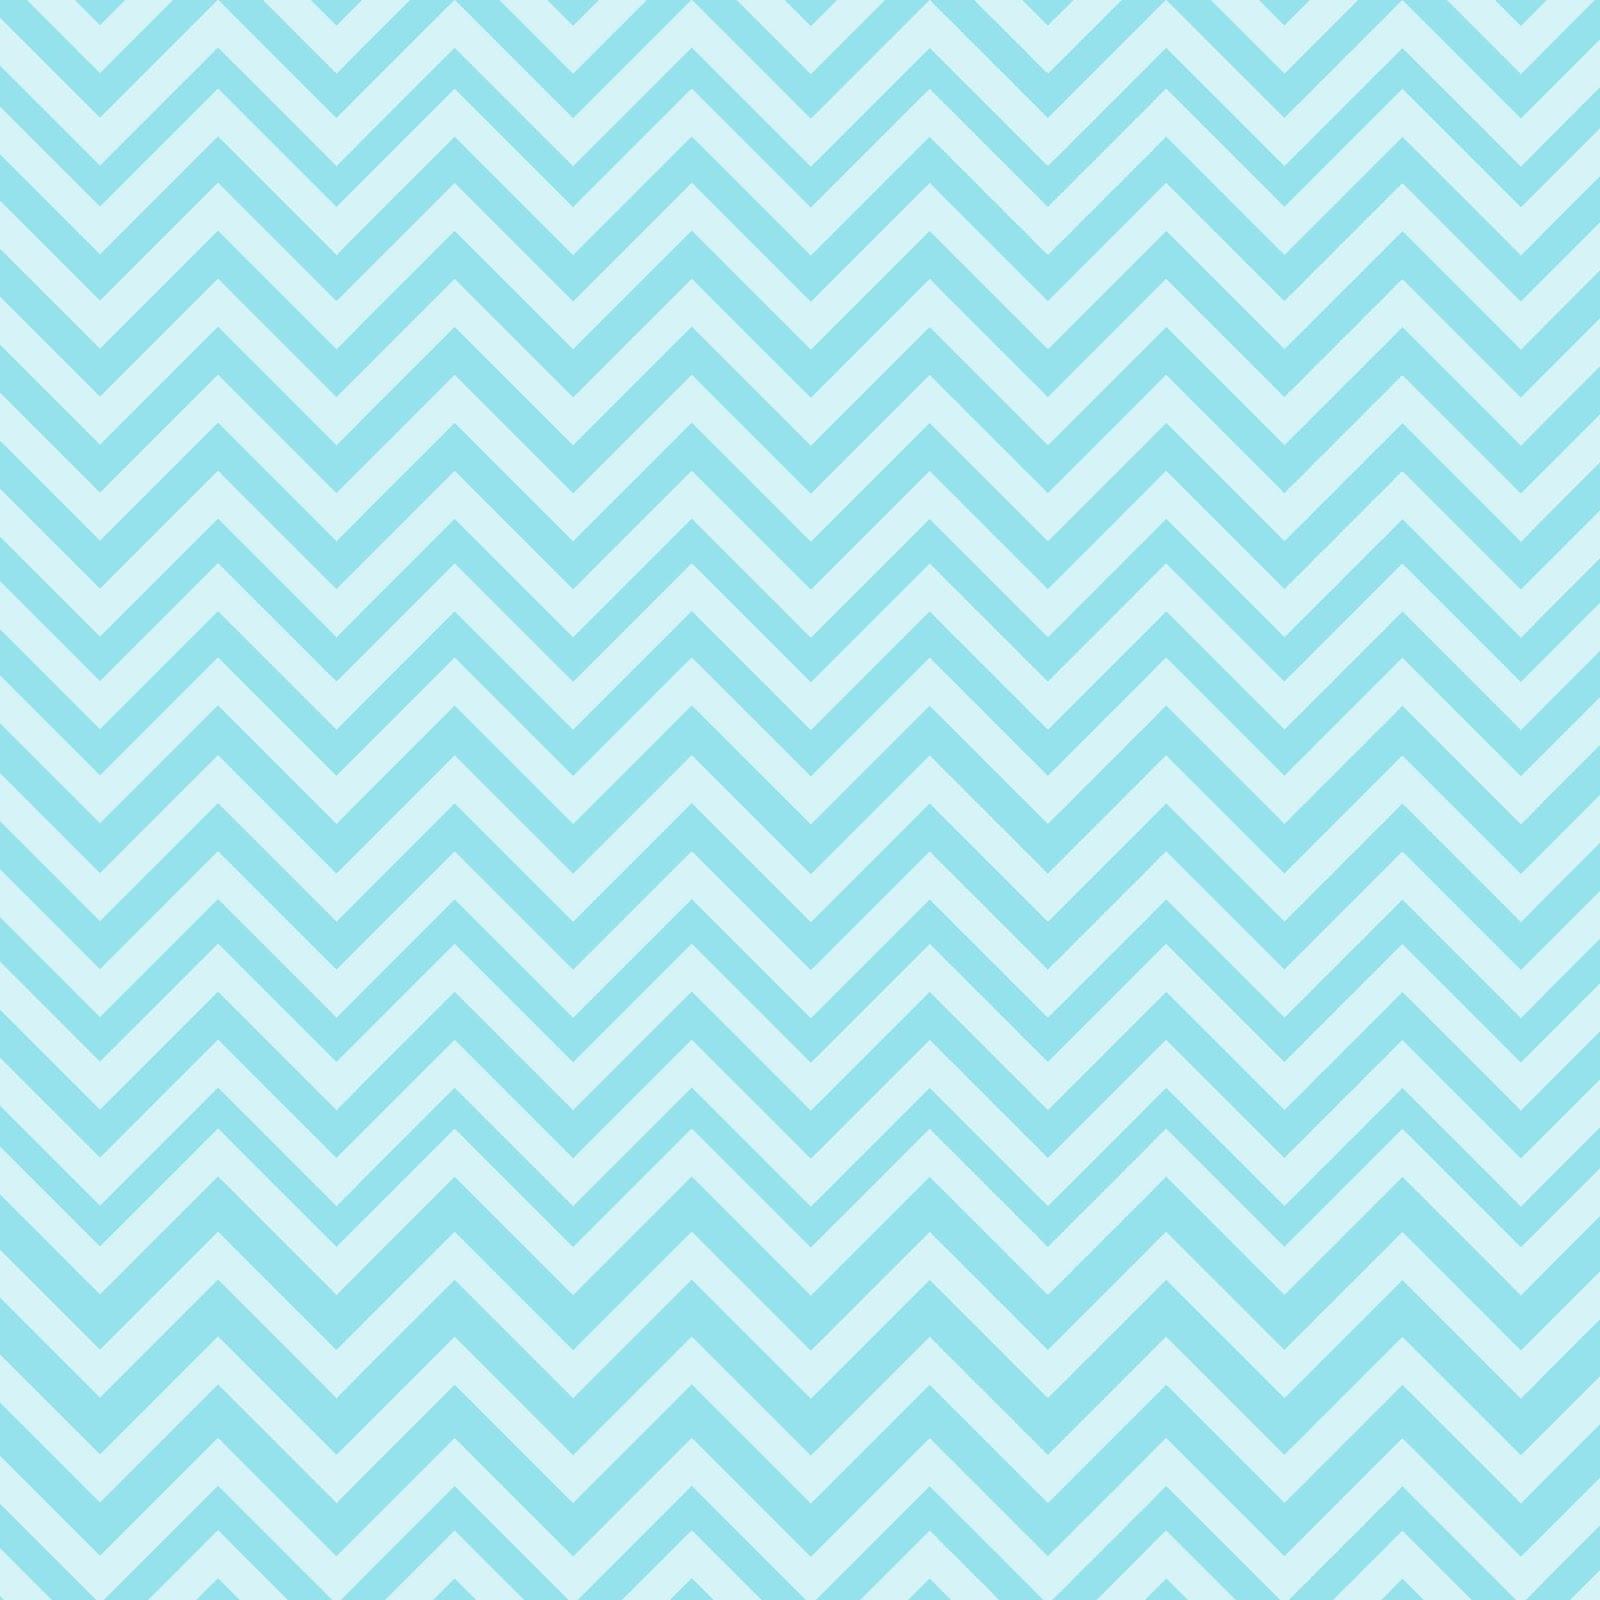 Blue Chevron Wallpaper Wallpapersafari